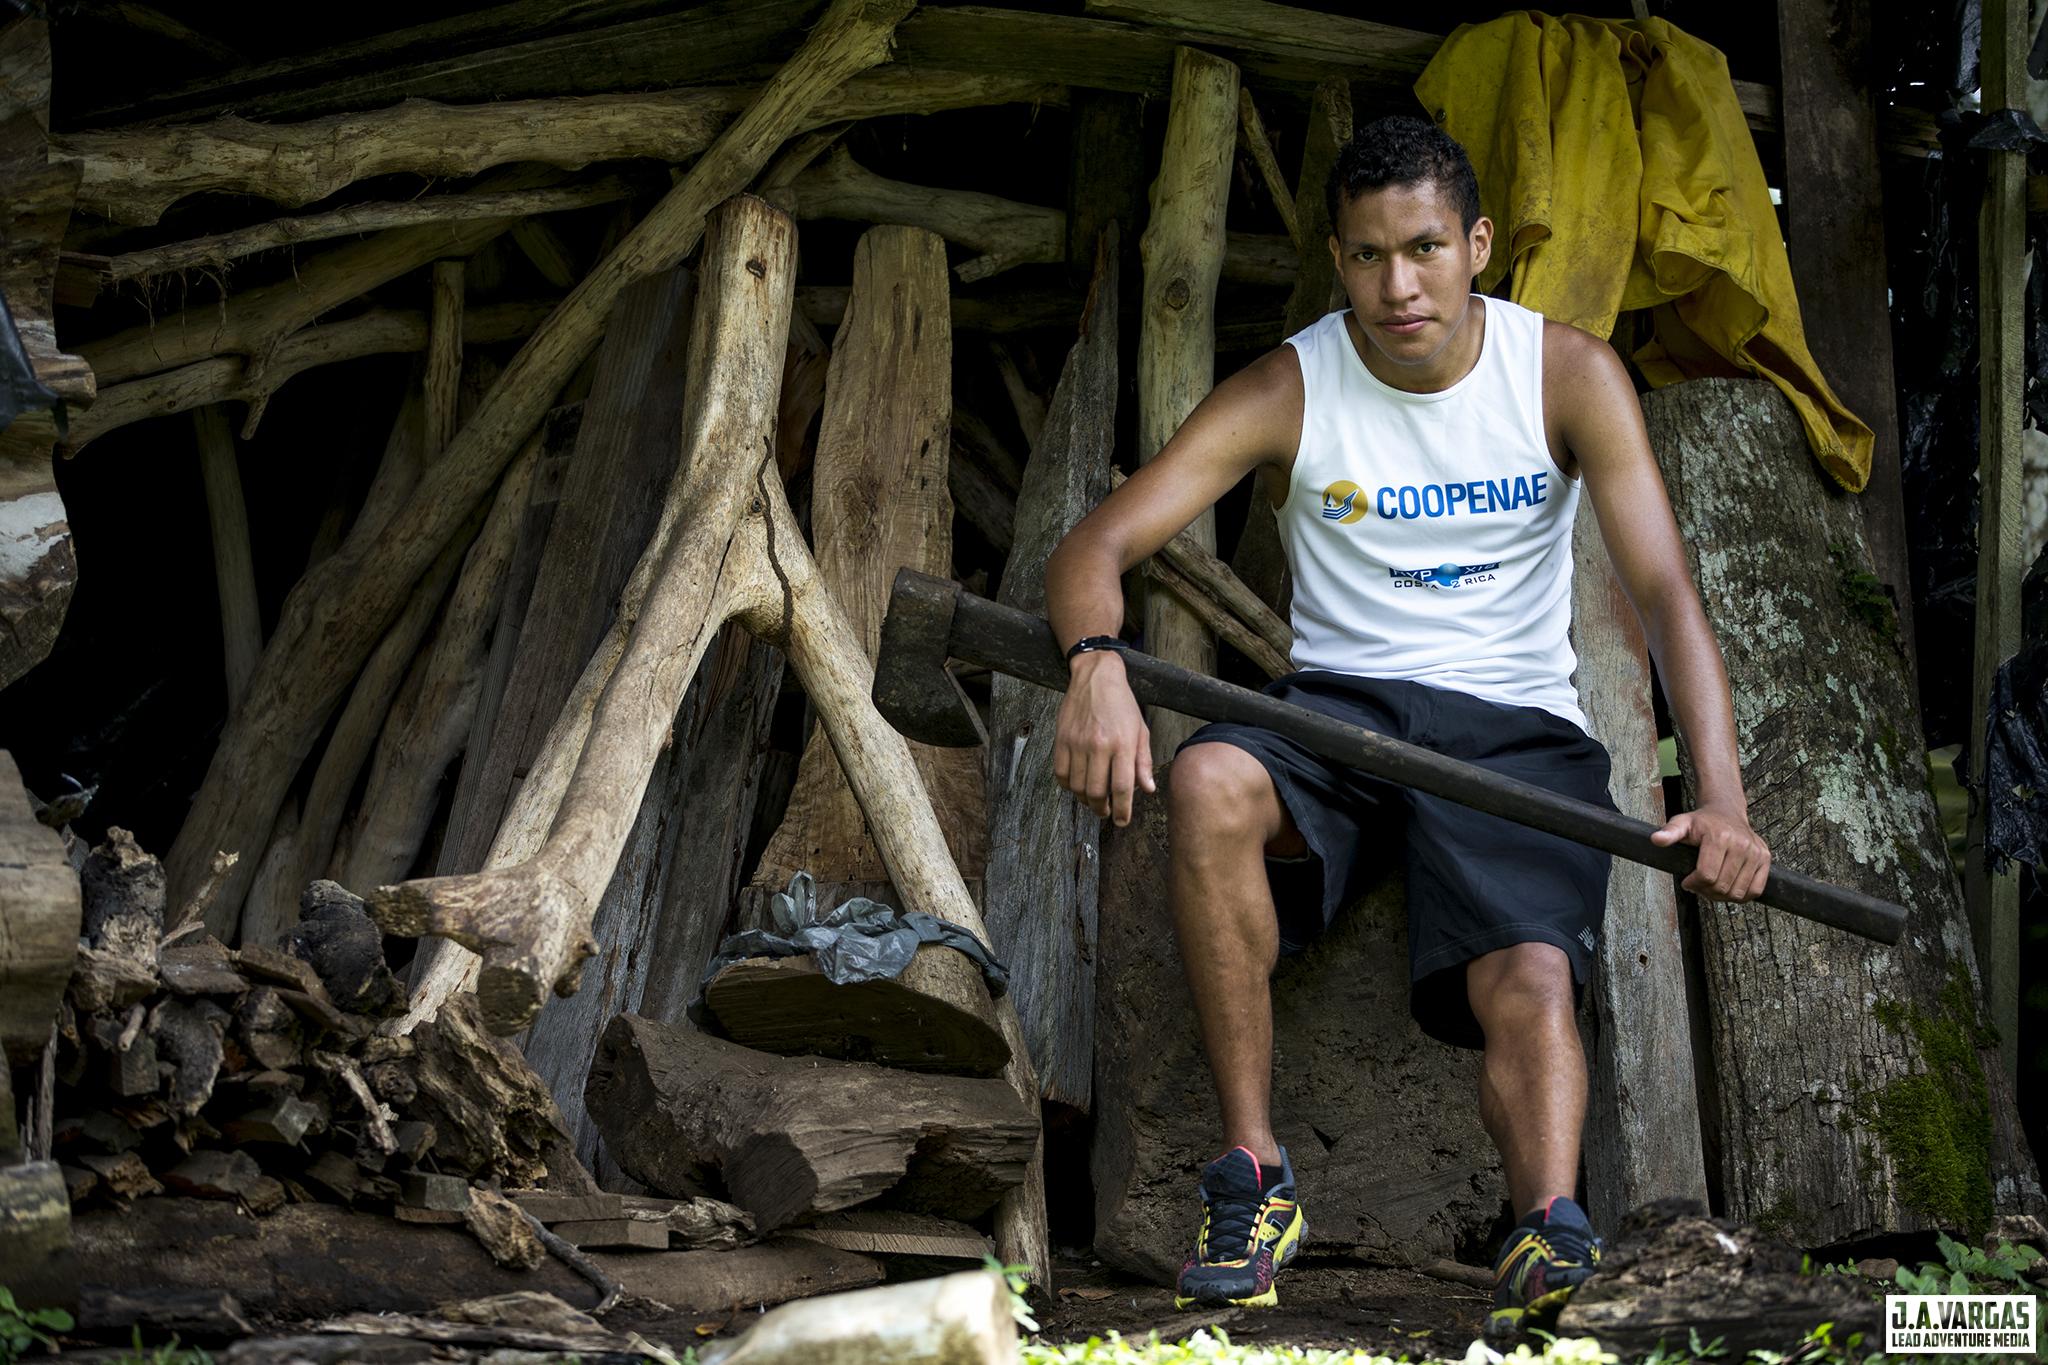 J. Andres Vargas - Lead Adventure Media720.jpg